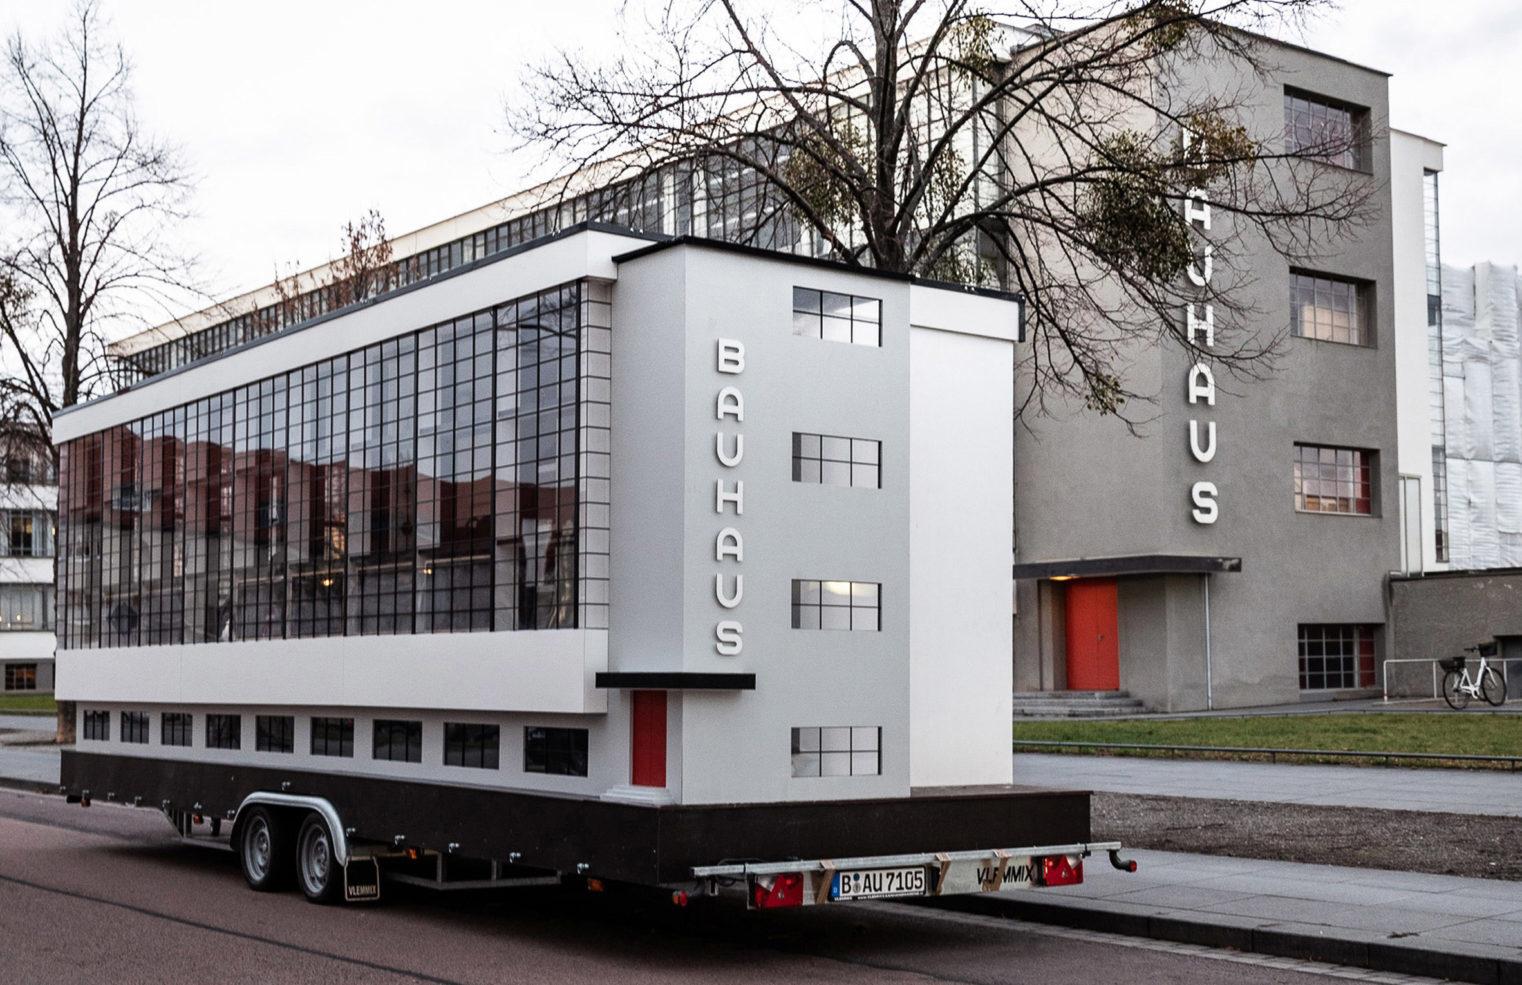 Bauhausbussen utanför Bauhaus i Dessau . Foto: Van Bo Le-Mentzel